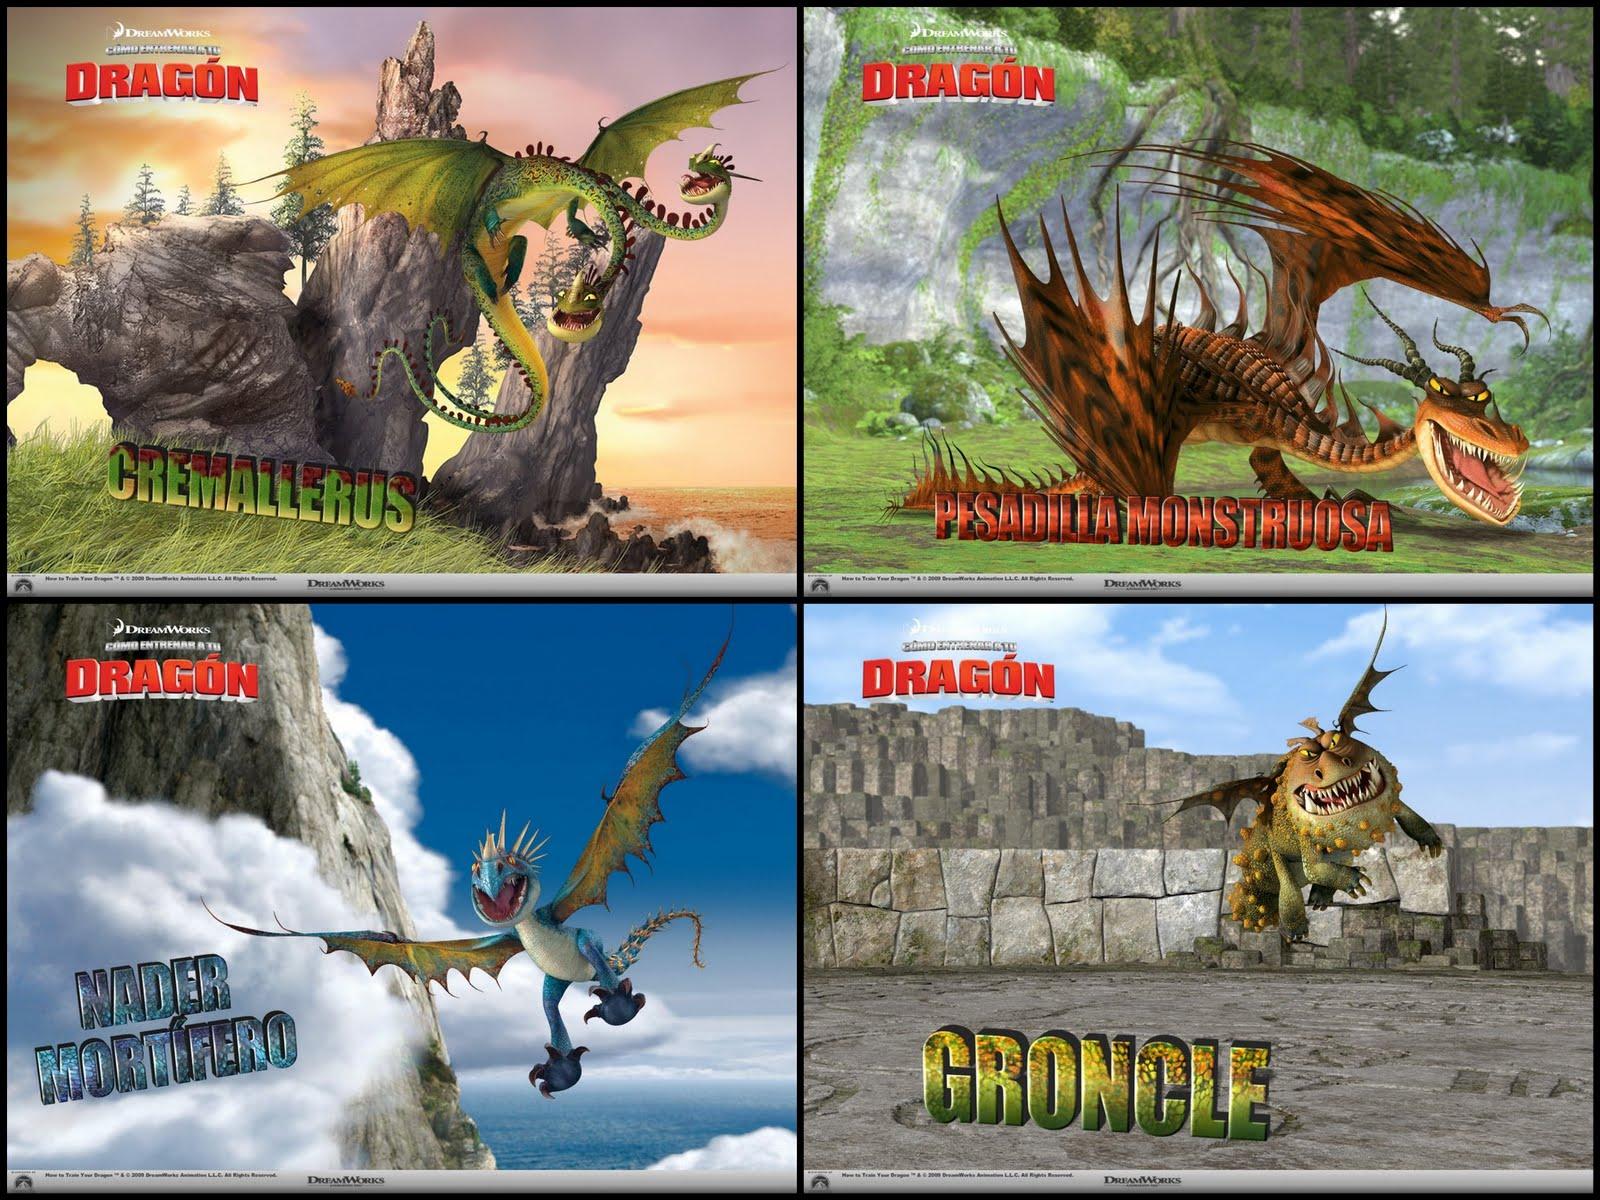 http://3.bp.blogspot.com/_RxkMyZVJnj8/S7o7izzXs5I/AAAAAAAAKo0/rvRgF99f8kQ/s1600/como+entrenar+a+tu+dragon.jpg